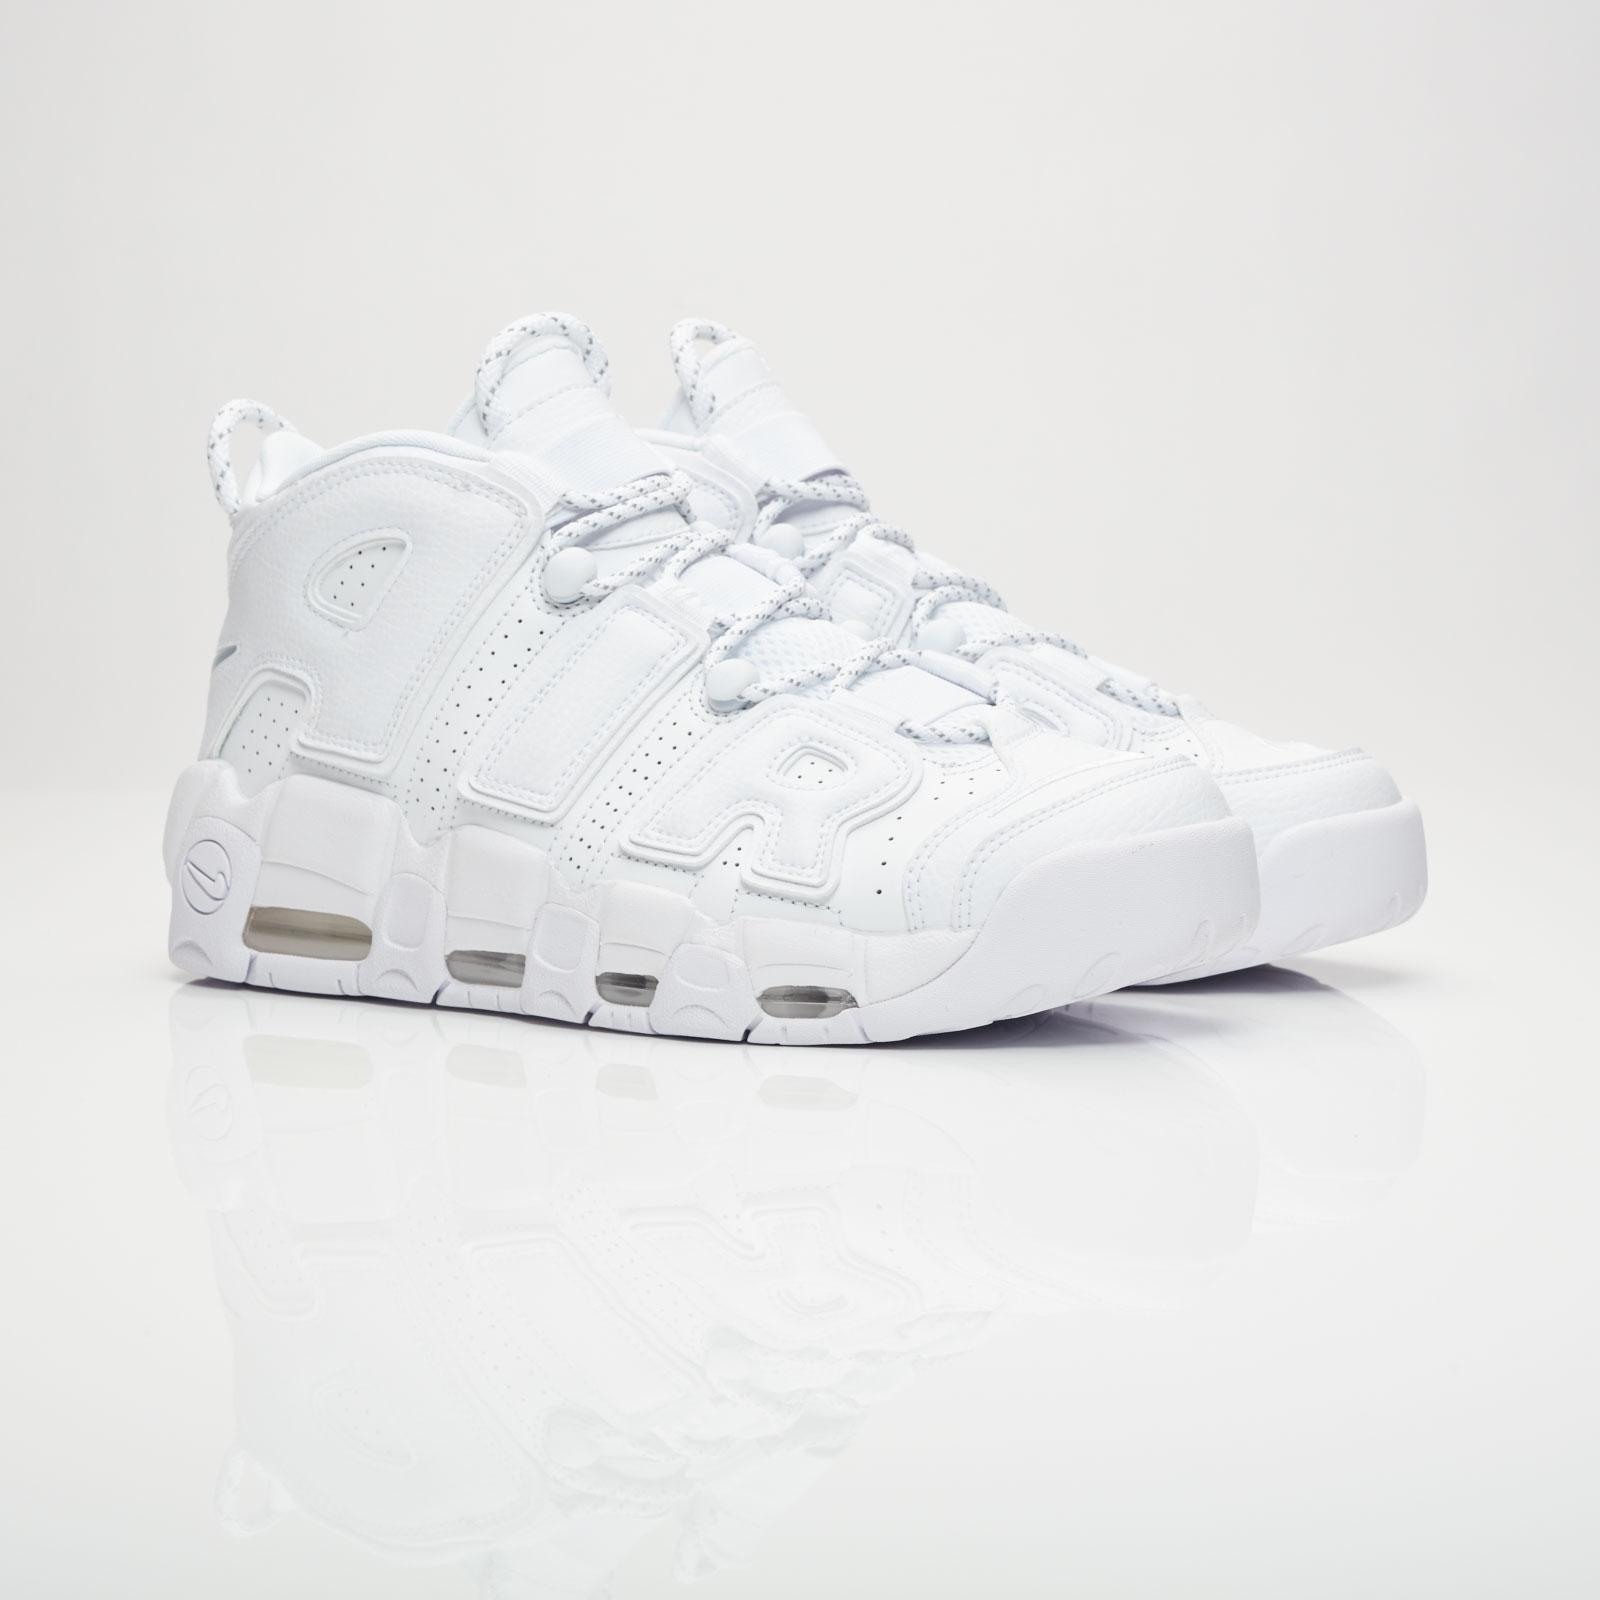 Nike Air More Uptempo ´96 | Blanc | Baskets | 921948 100